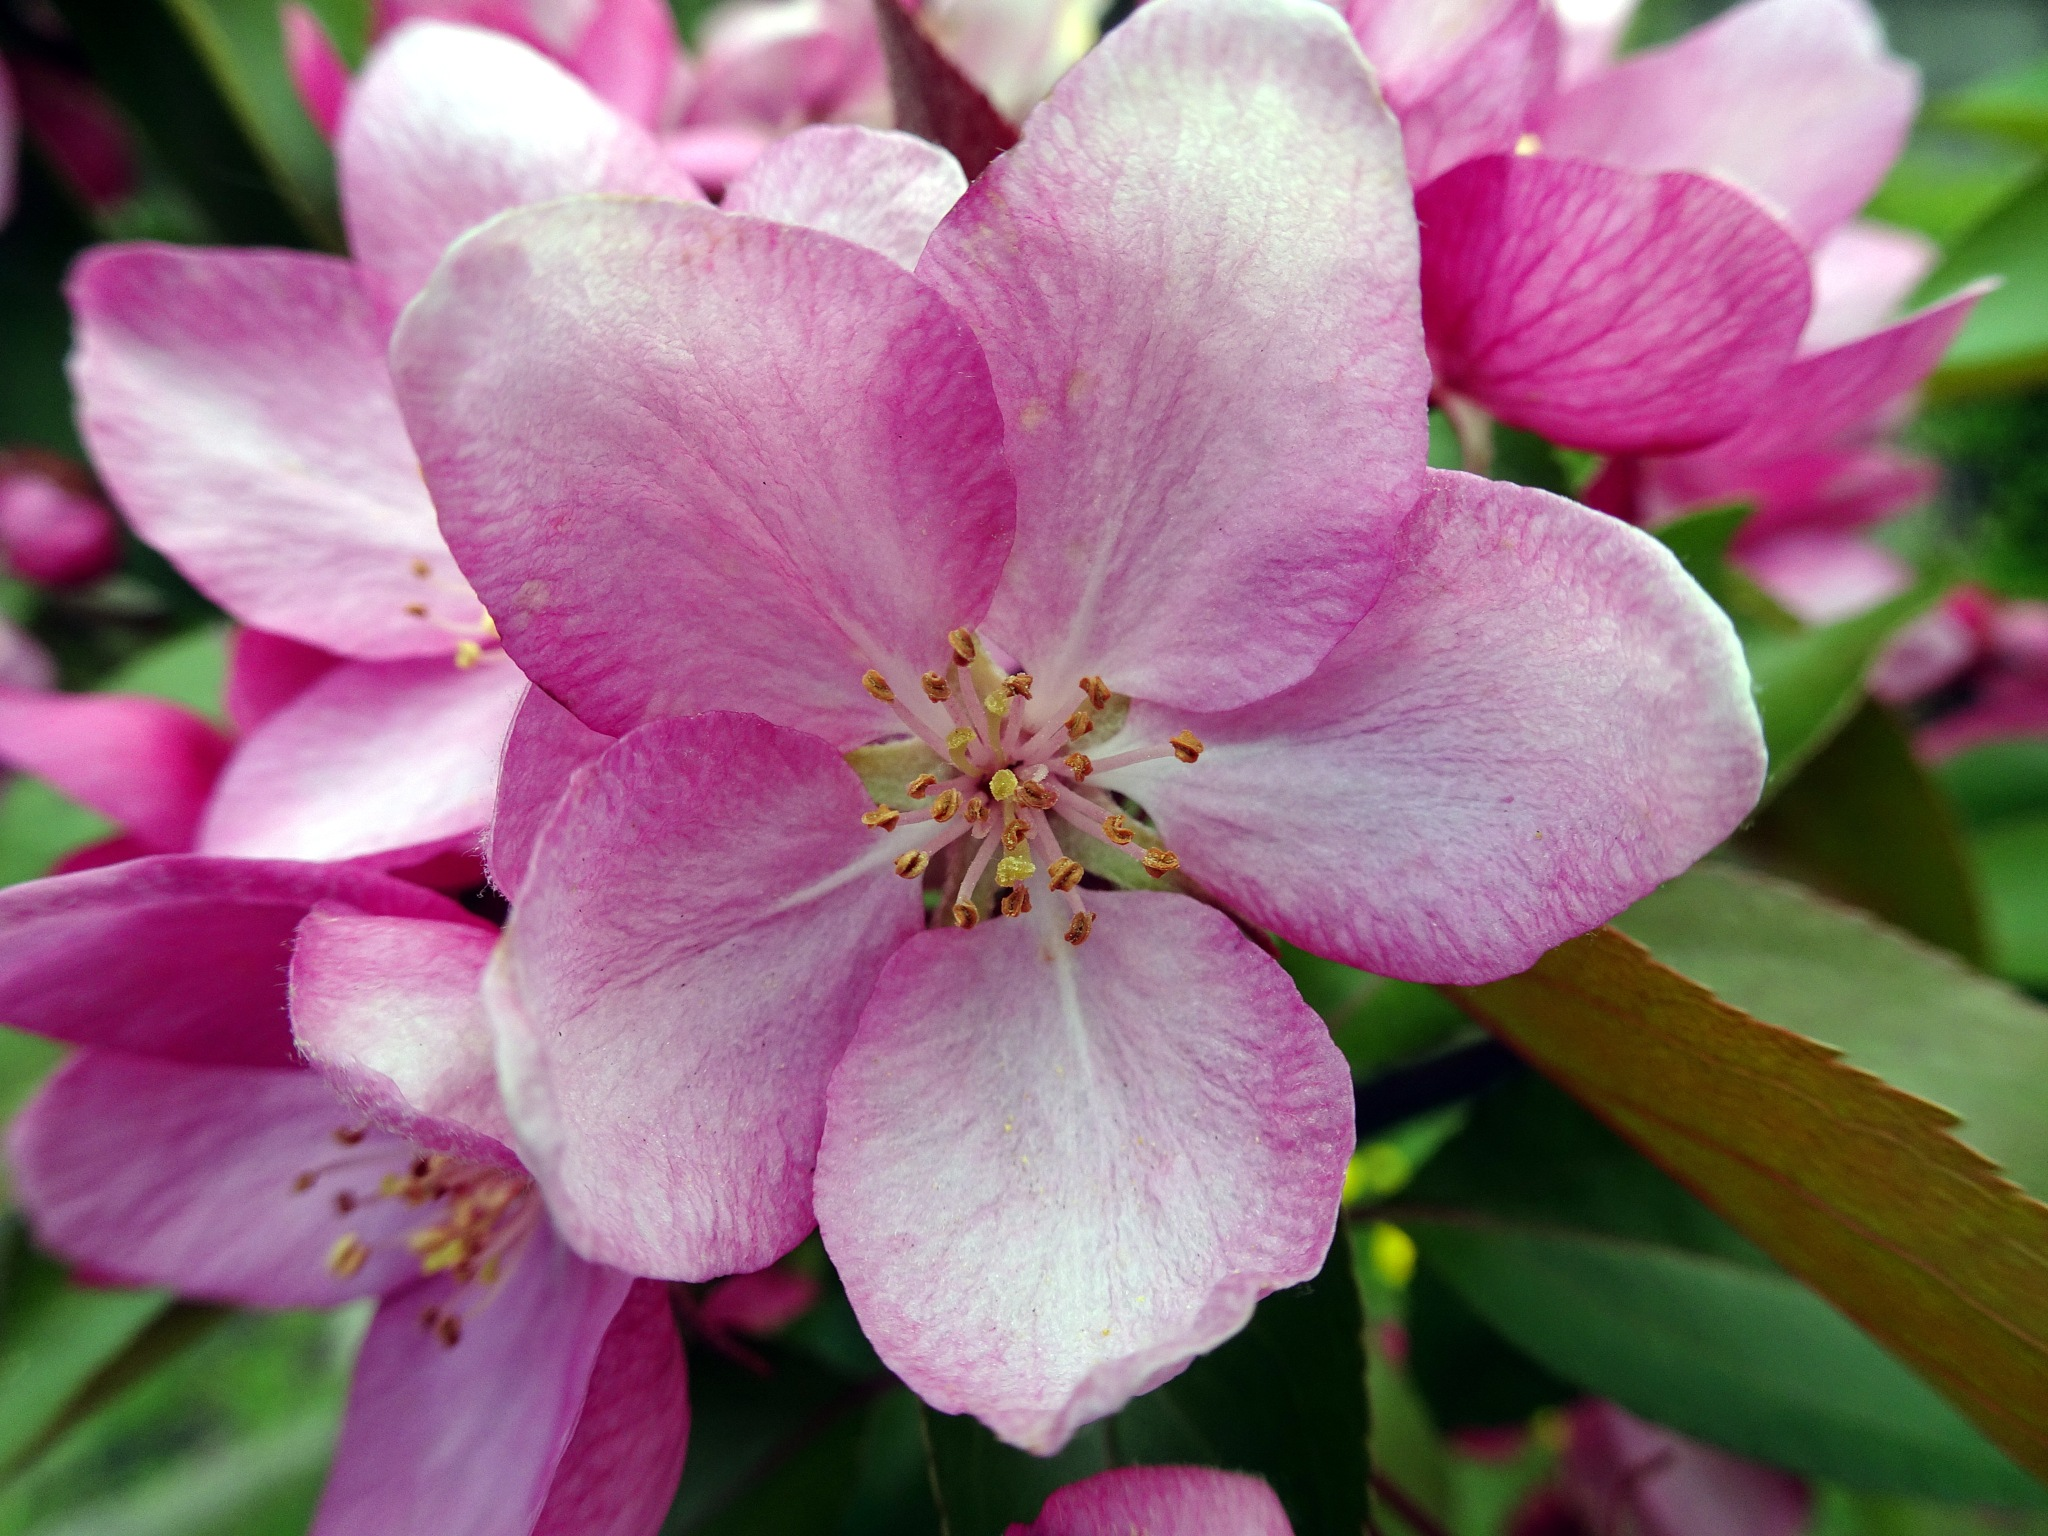 Beauty flower by twelvephotography